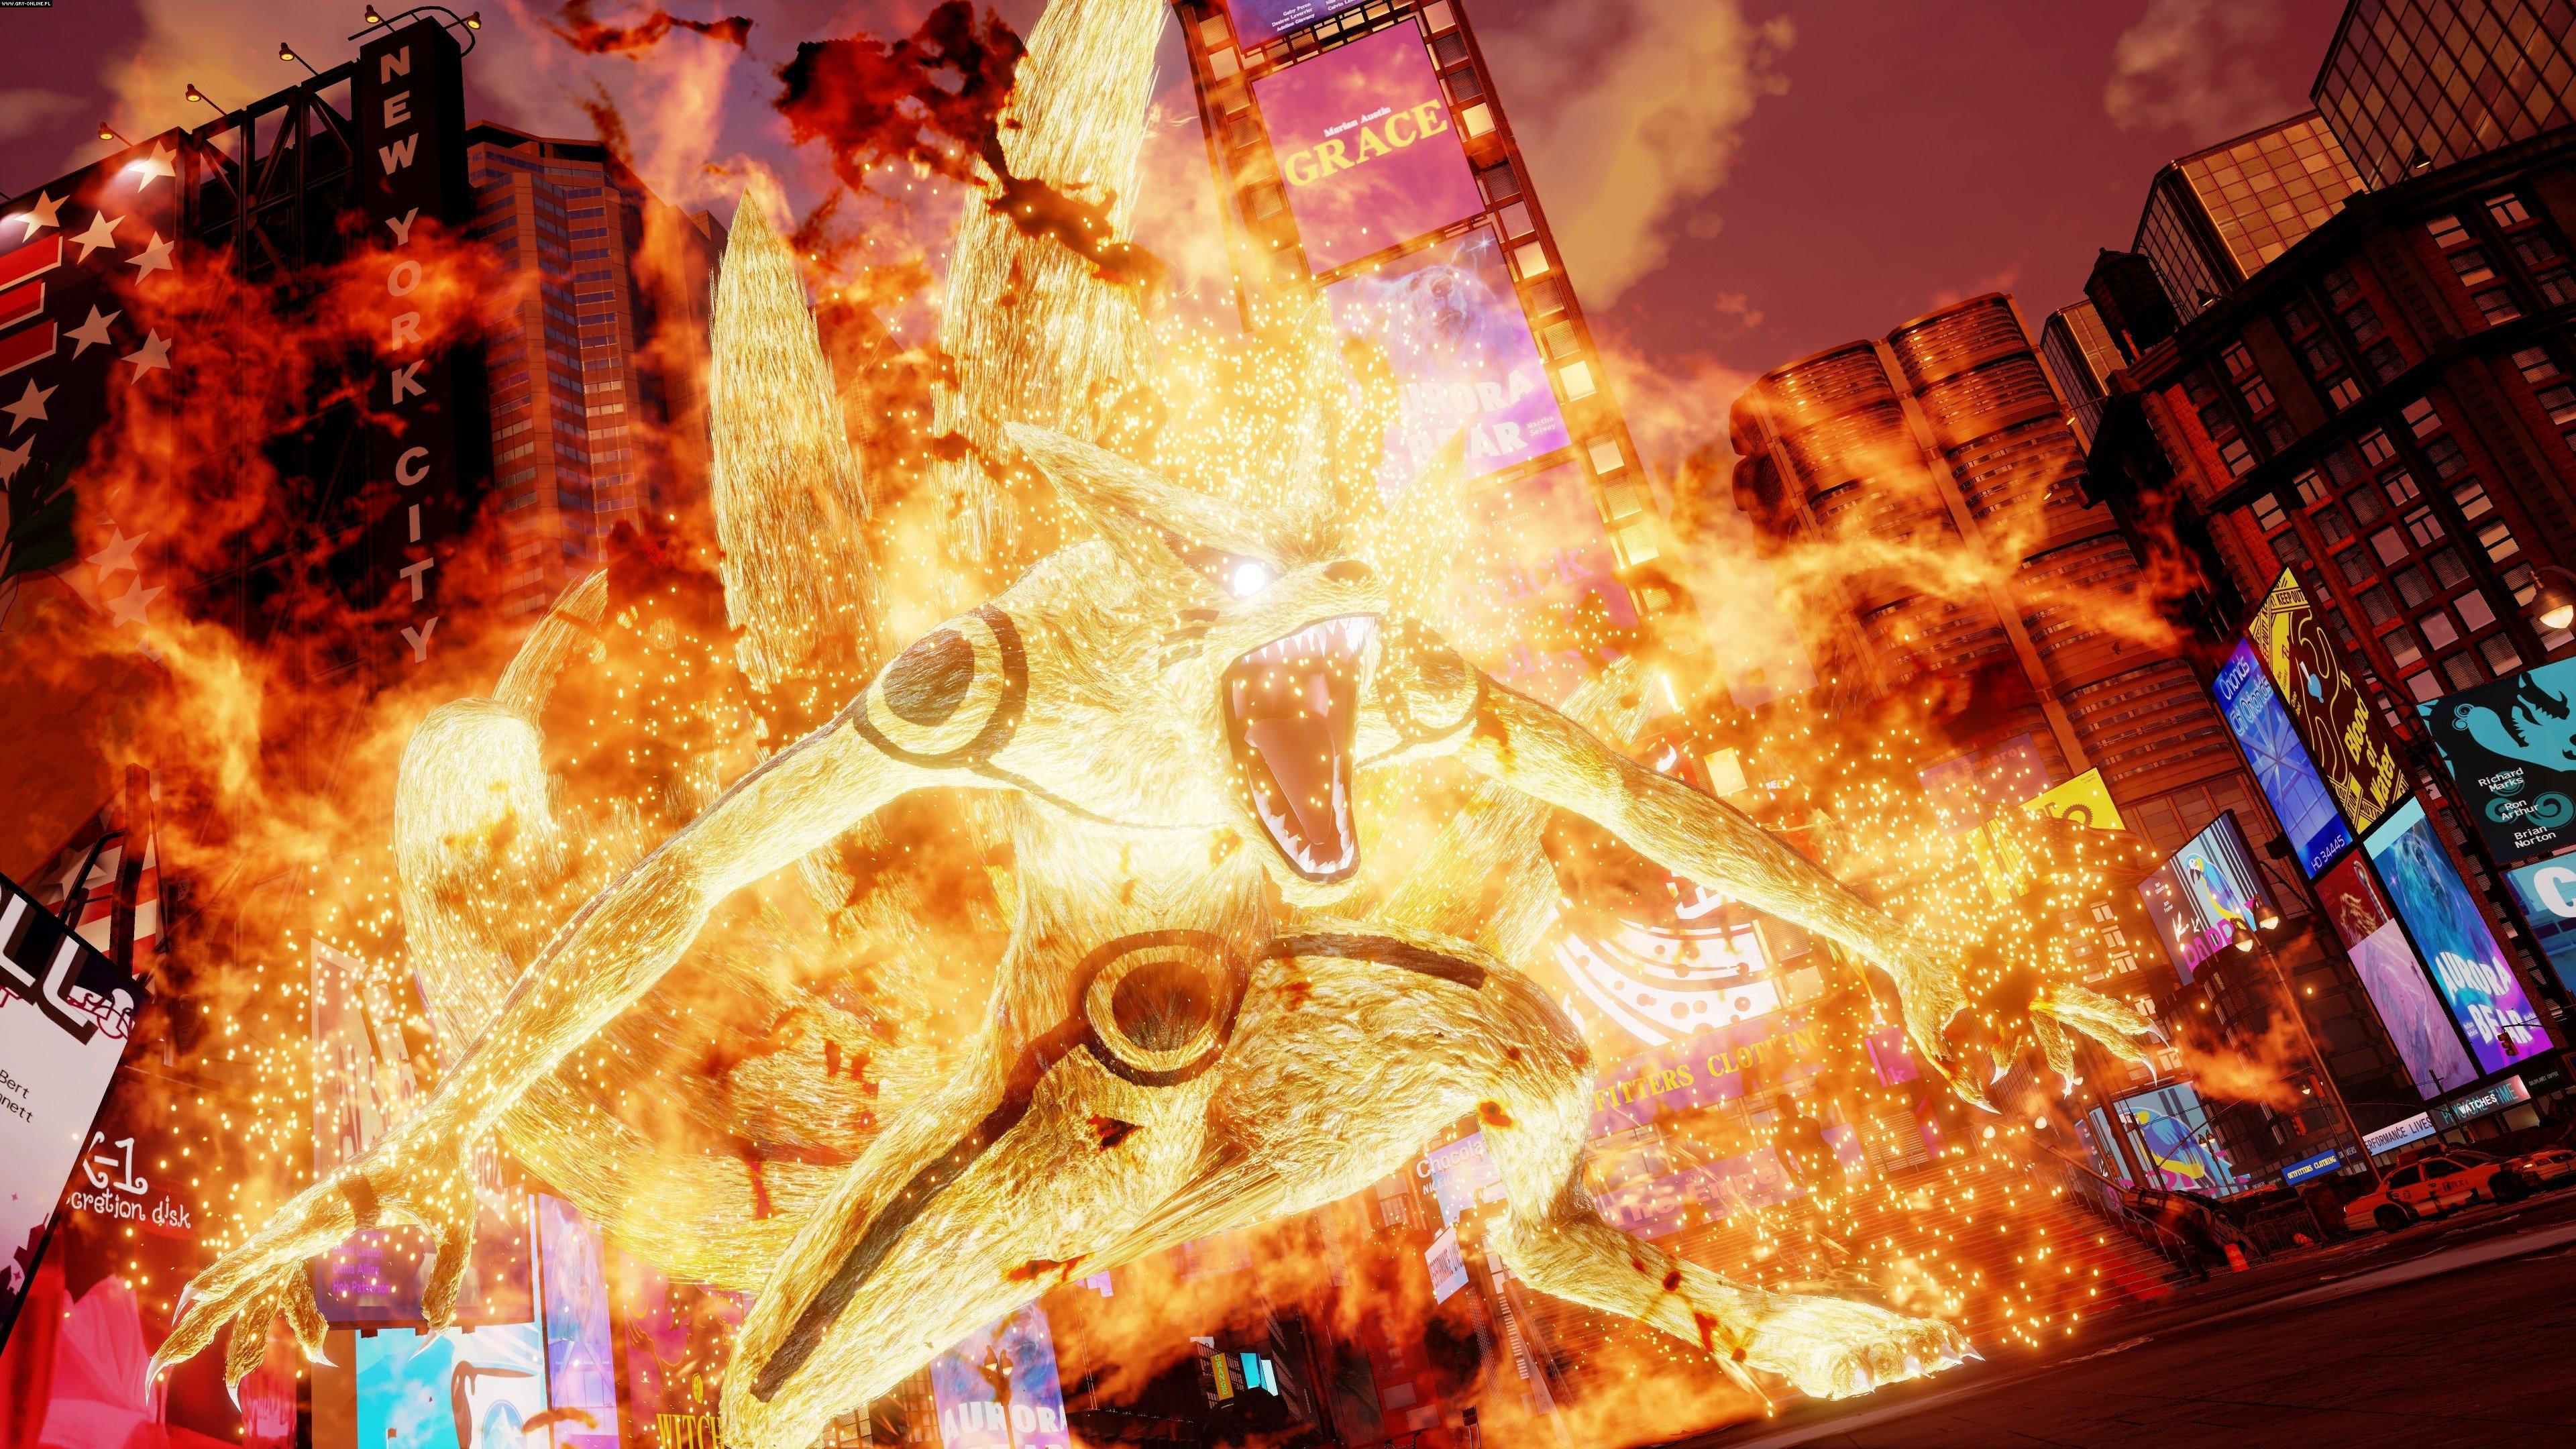 Jump Force PC, PS4, XONE Games Image 209/212, Spike Chunsoft, Bandai Namco Entertainment